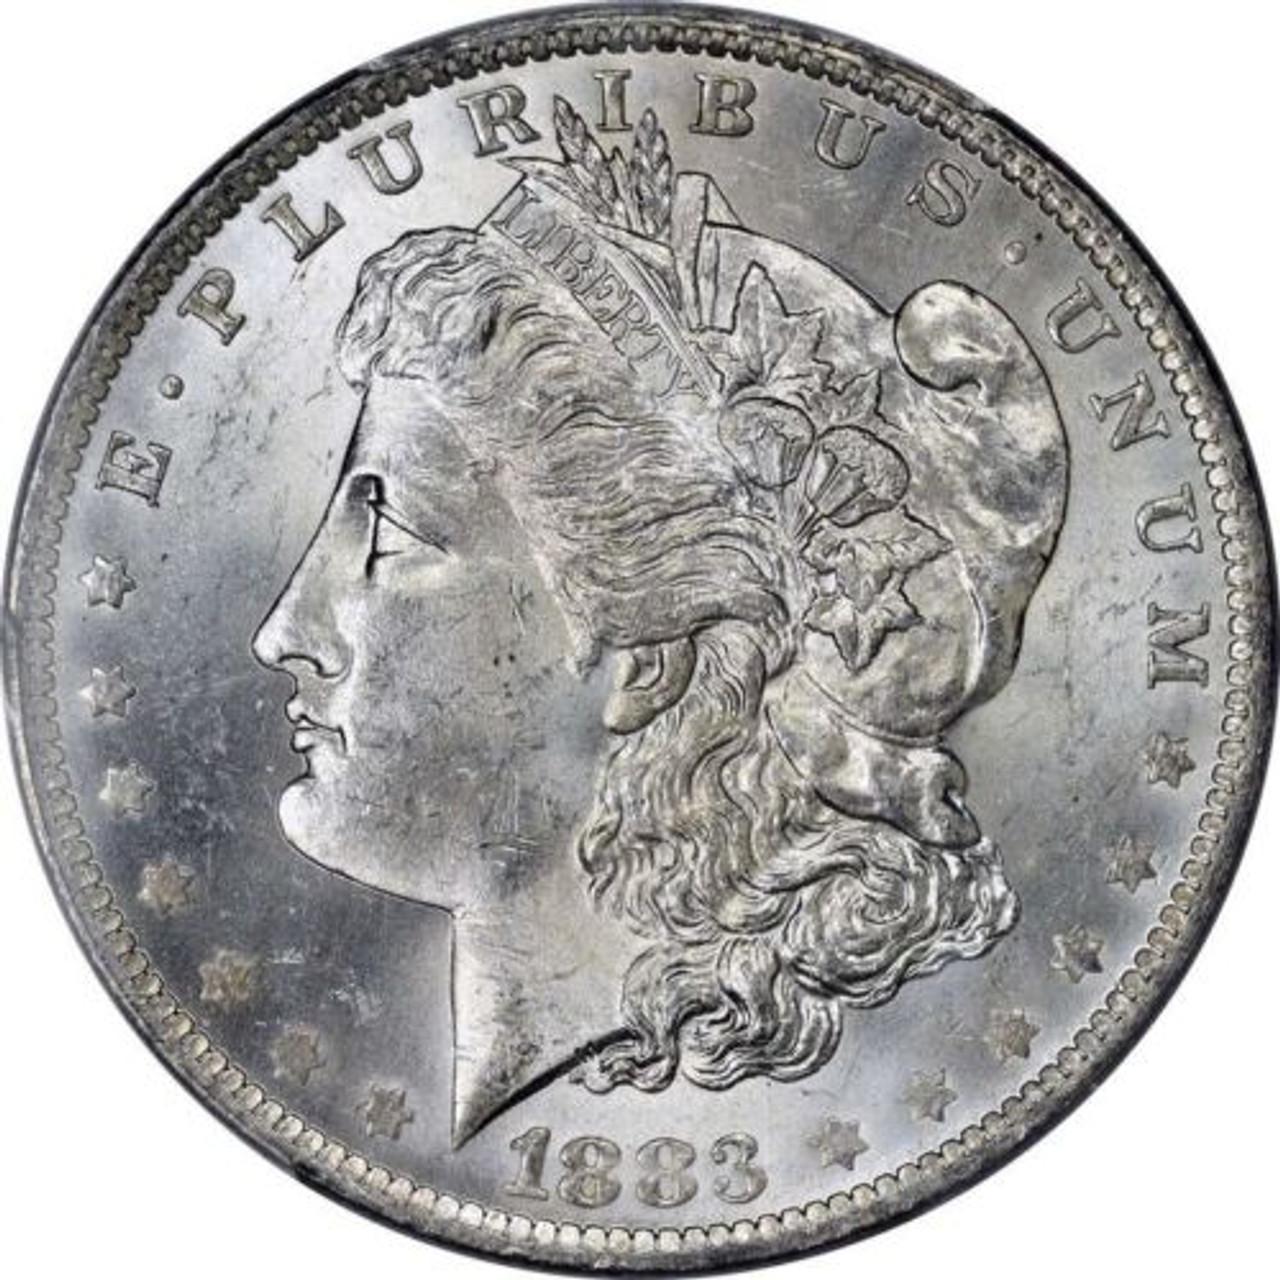 BU 1883-P Morgan Silver Dollar Brilliant Uncirculated